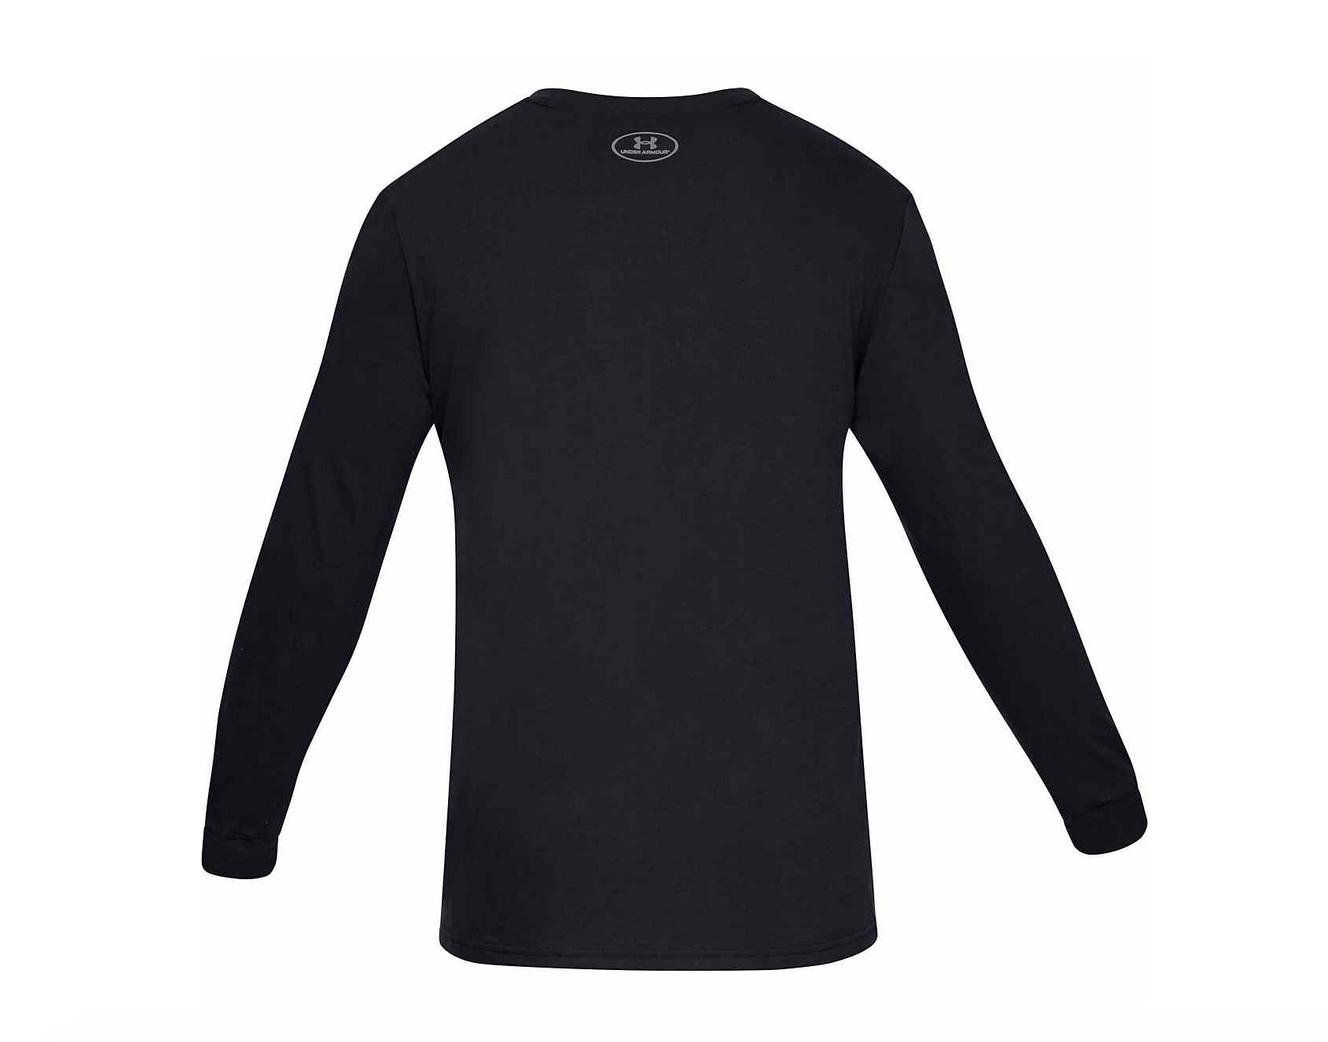 Under Armour Men/'s boxed logo Long-Sleeve T-shirt Camo black or white